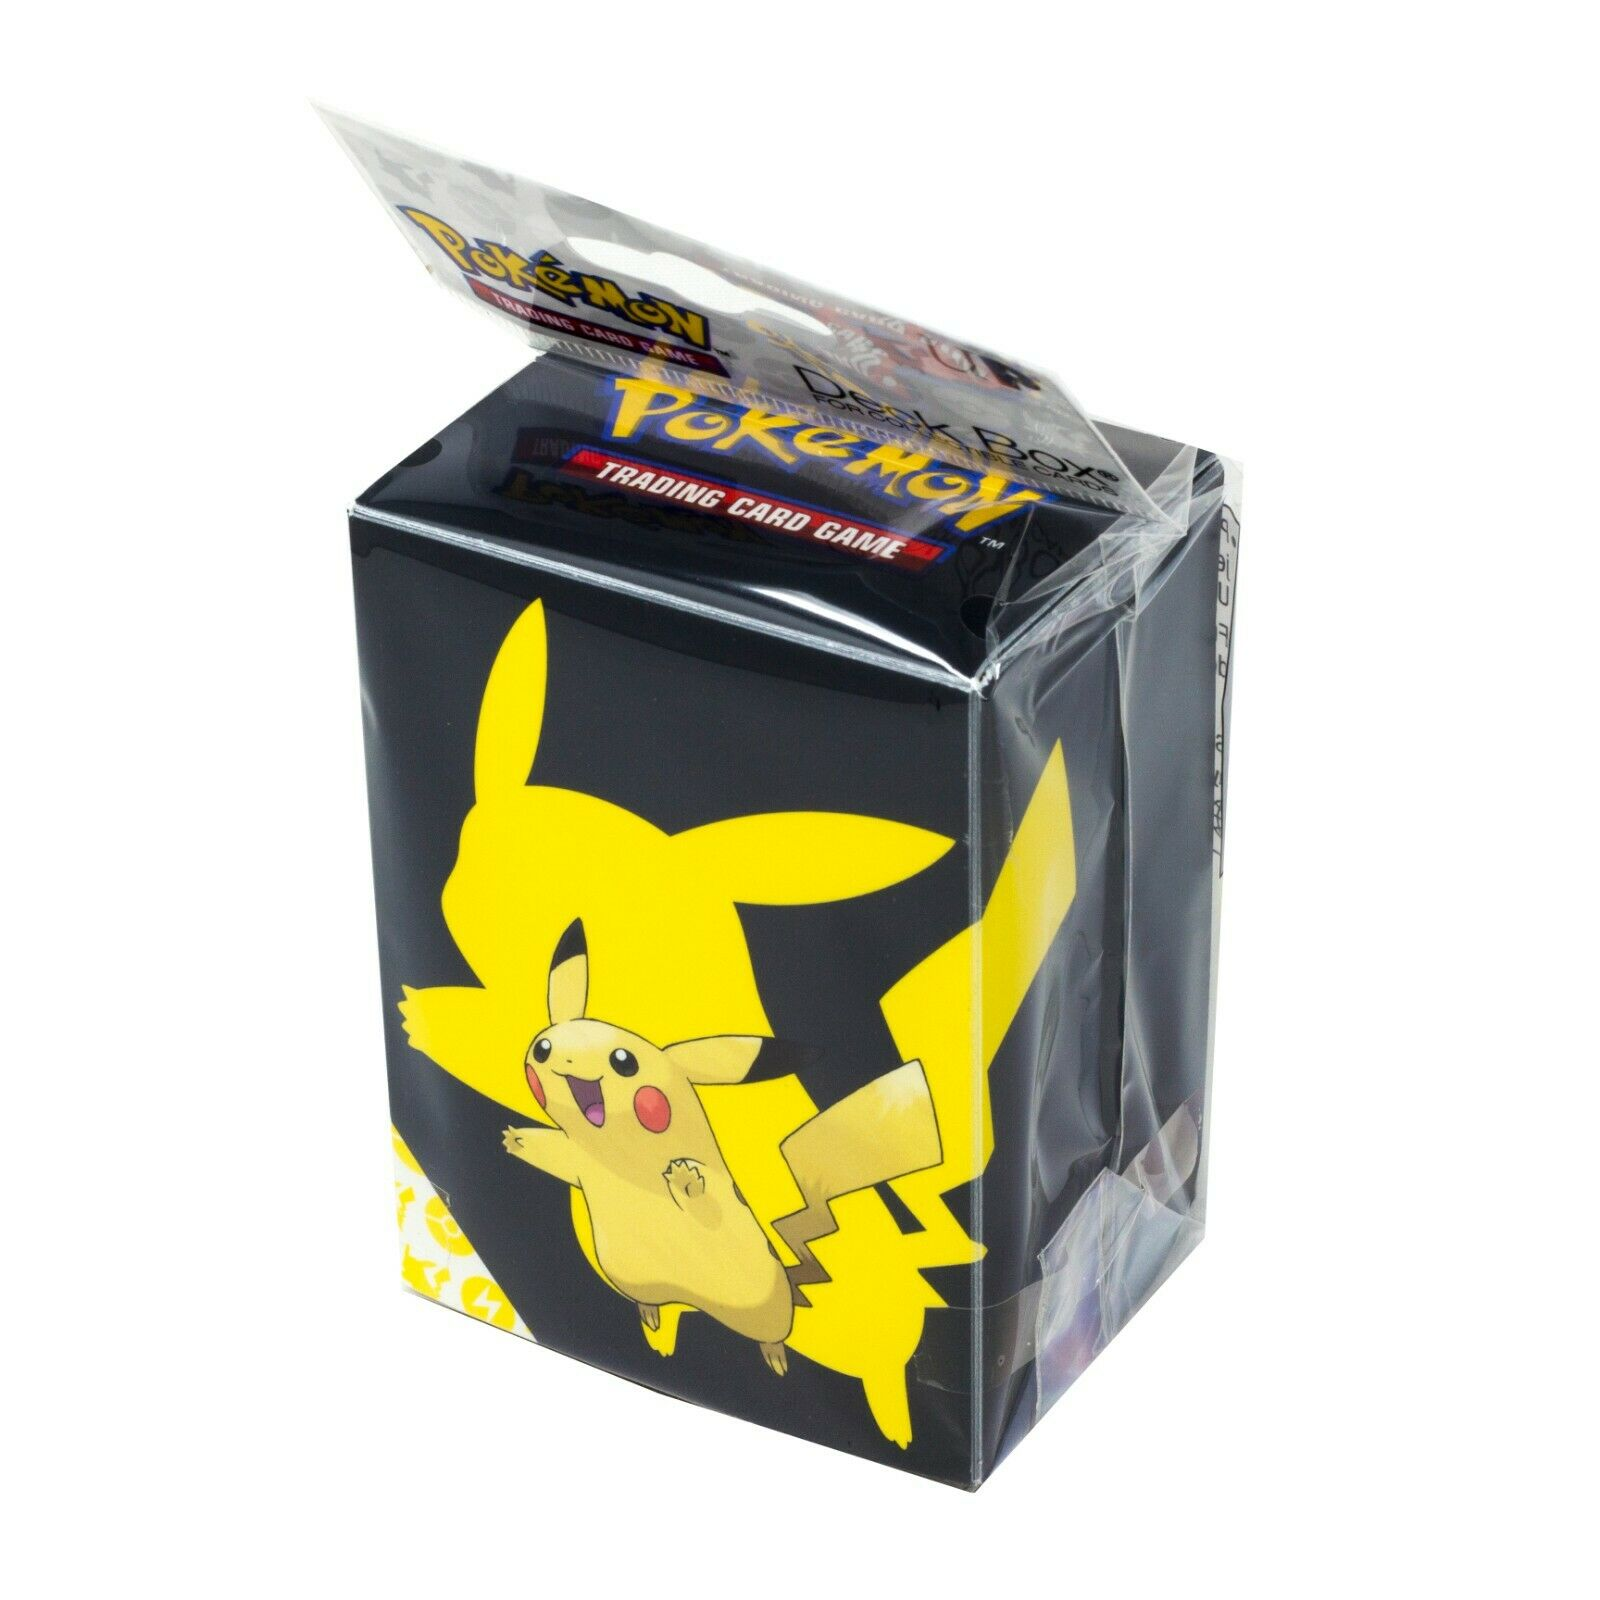 Ultra Pro Pokemon TCG 2019 Pikachu Deck Box Card Storage/Hol